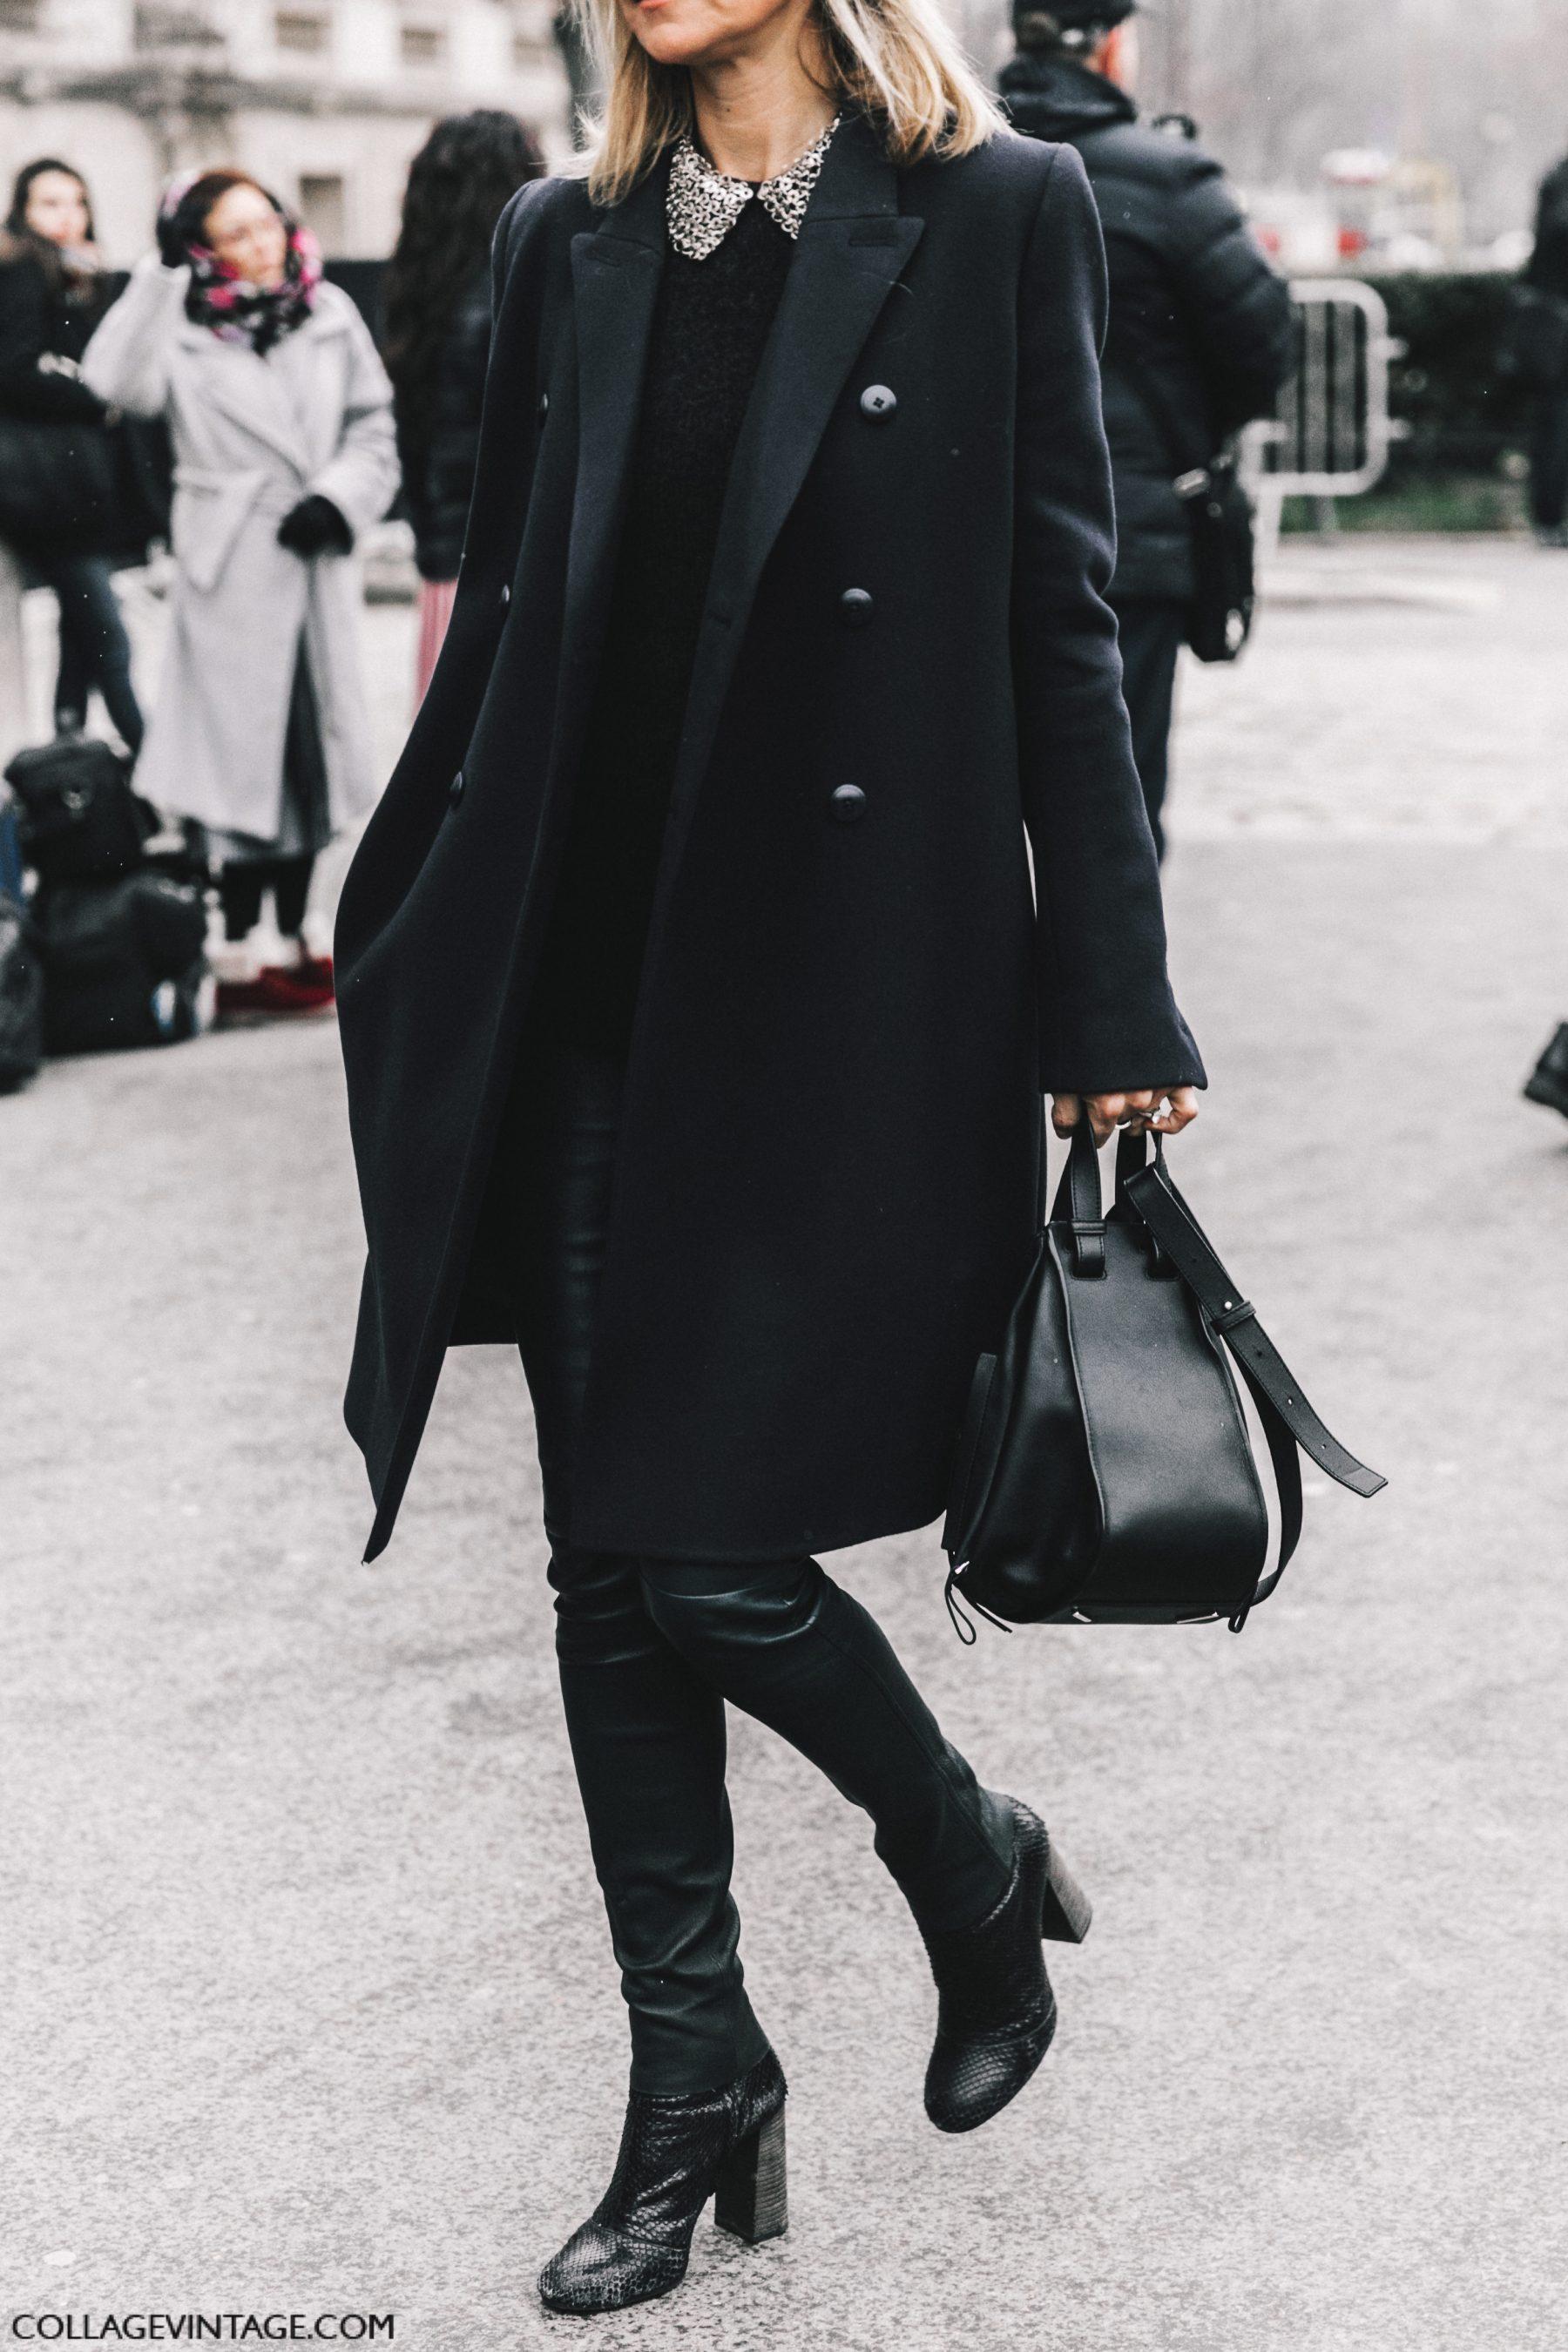 Blackfashion Blog Facebook Puksies Wardrobe Tumblr: Street Style Paris Couture III